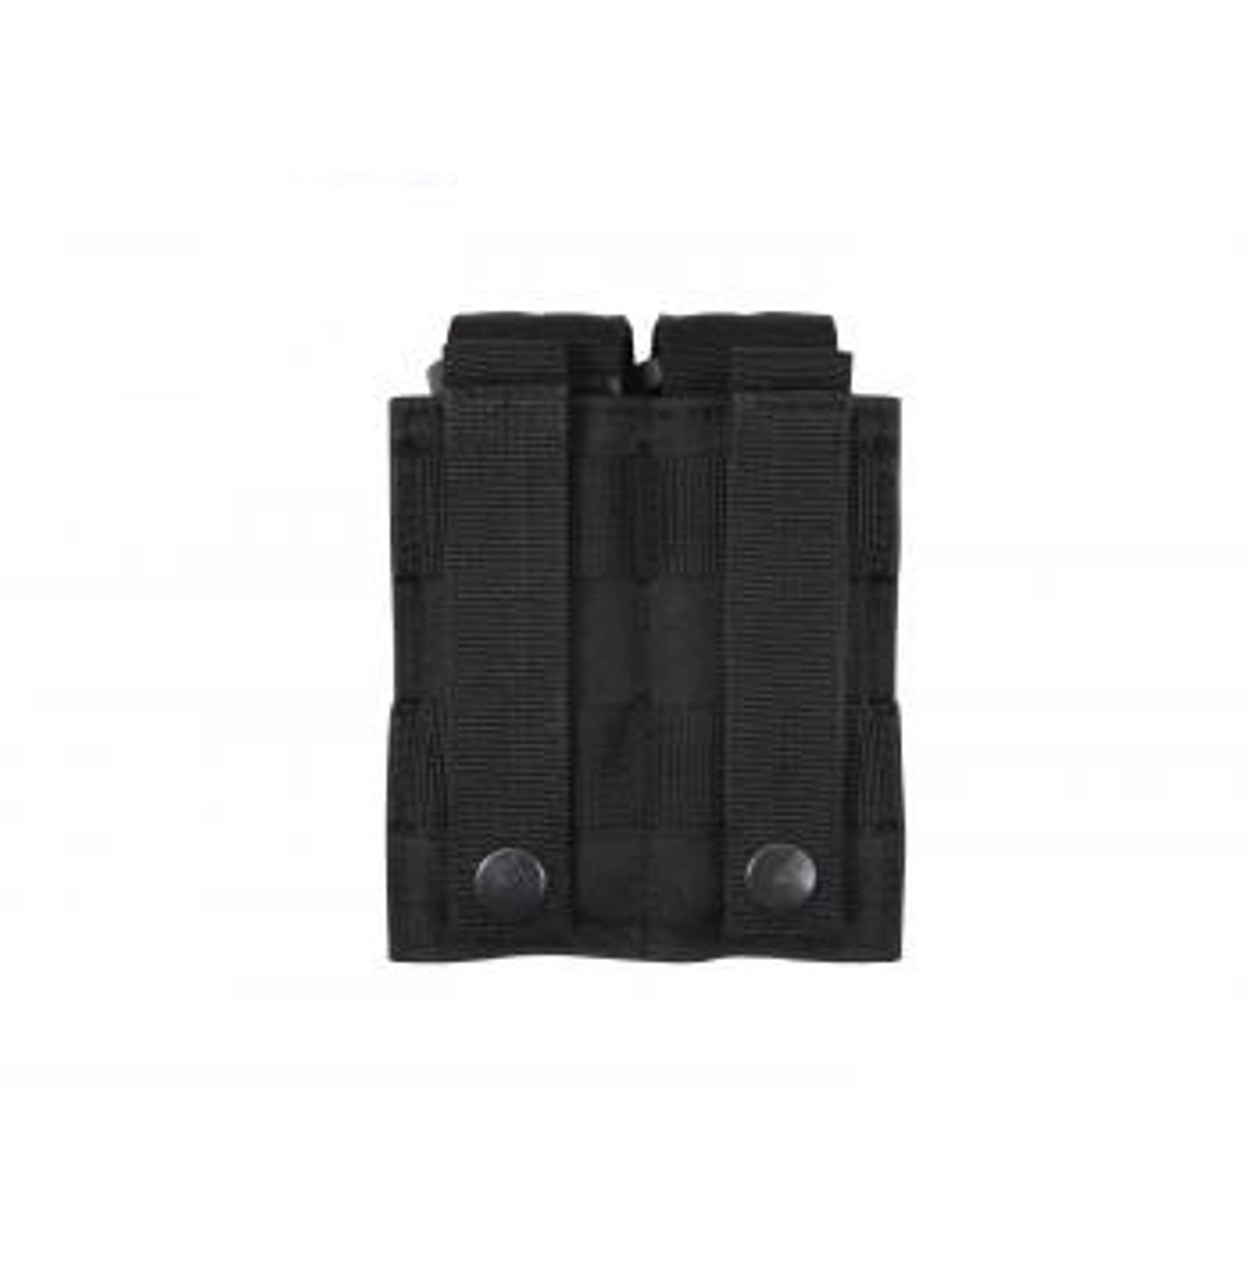 Double Pistol Mag Pouch Molle straps